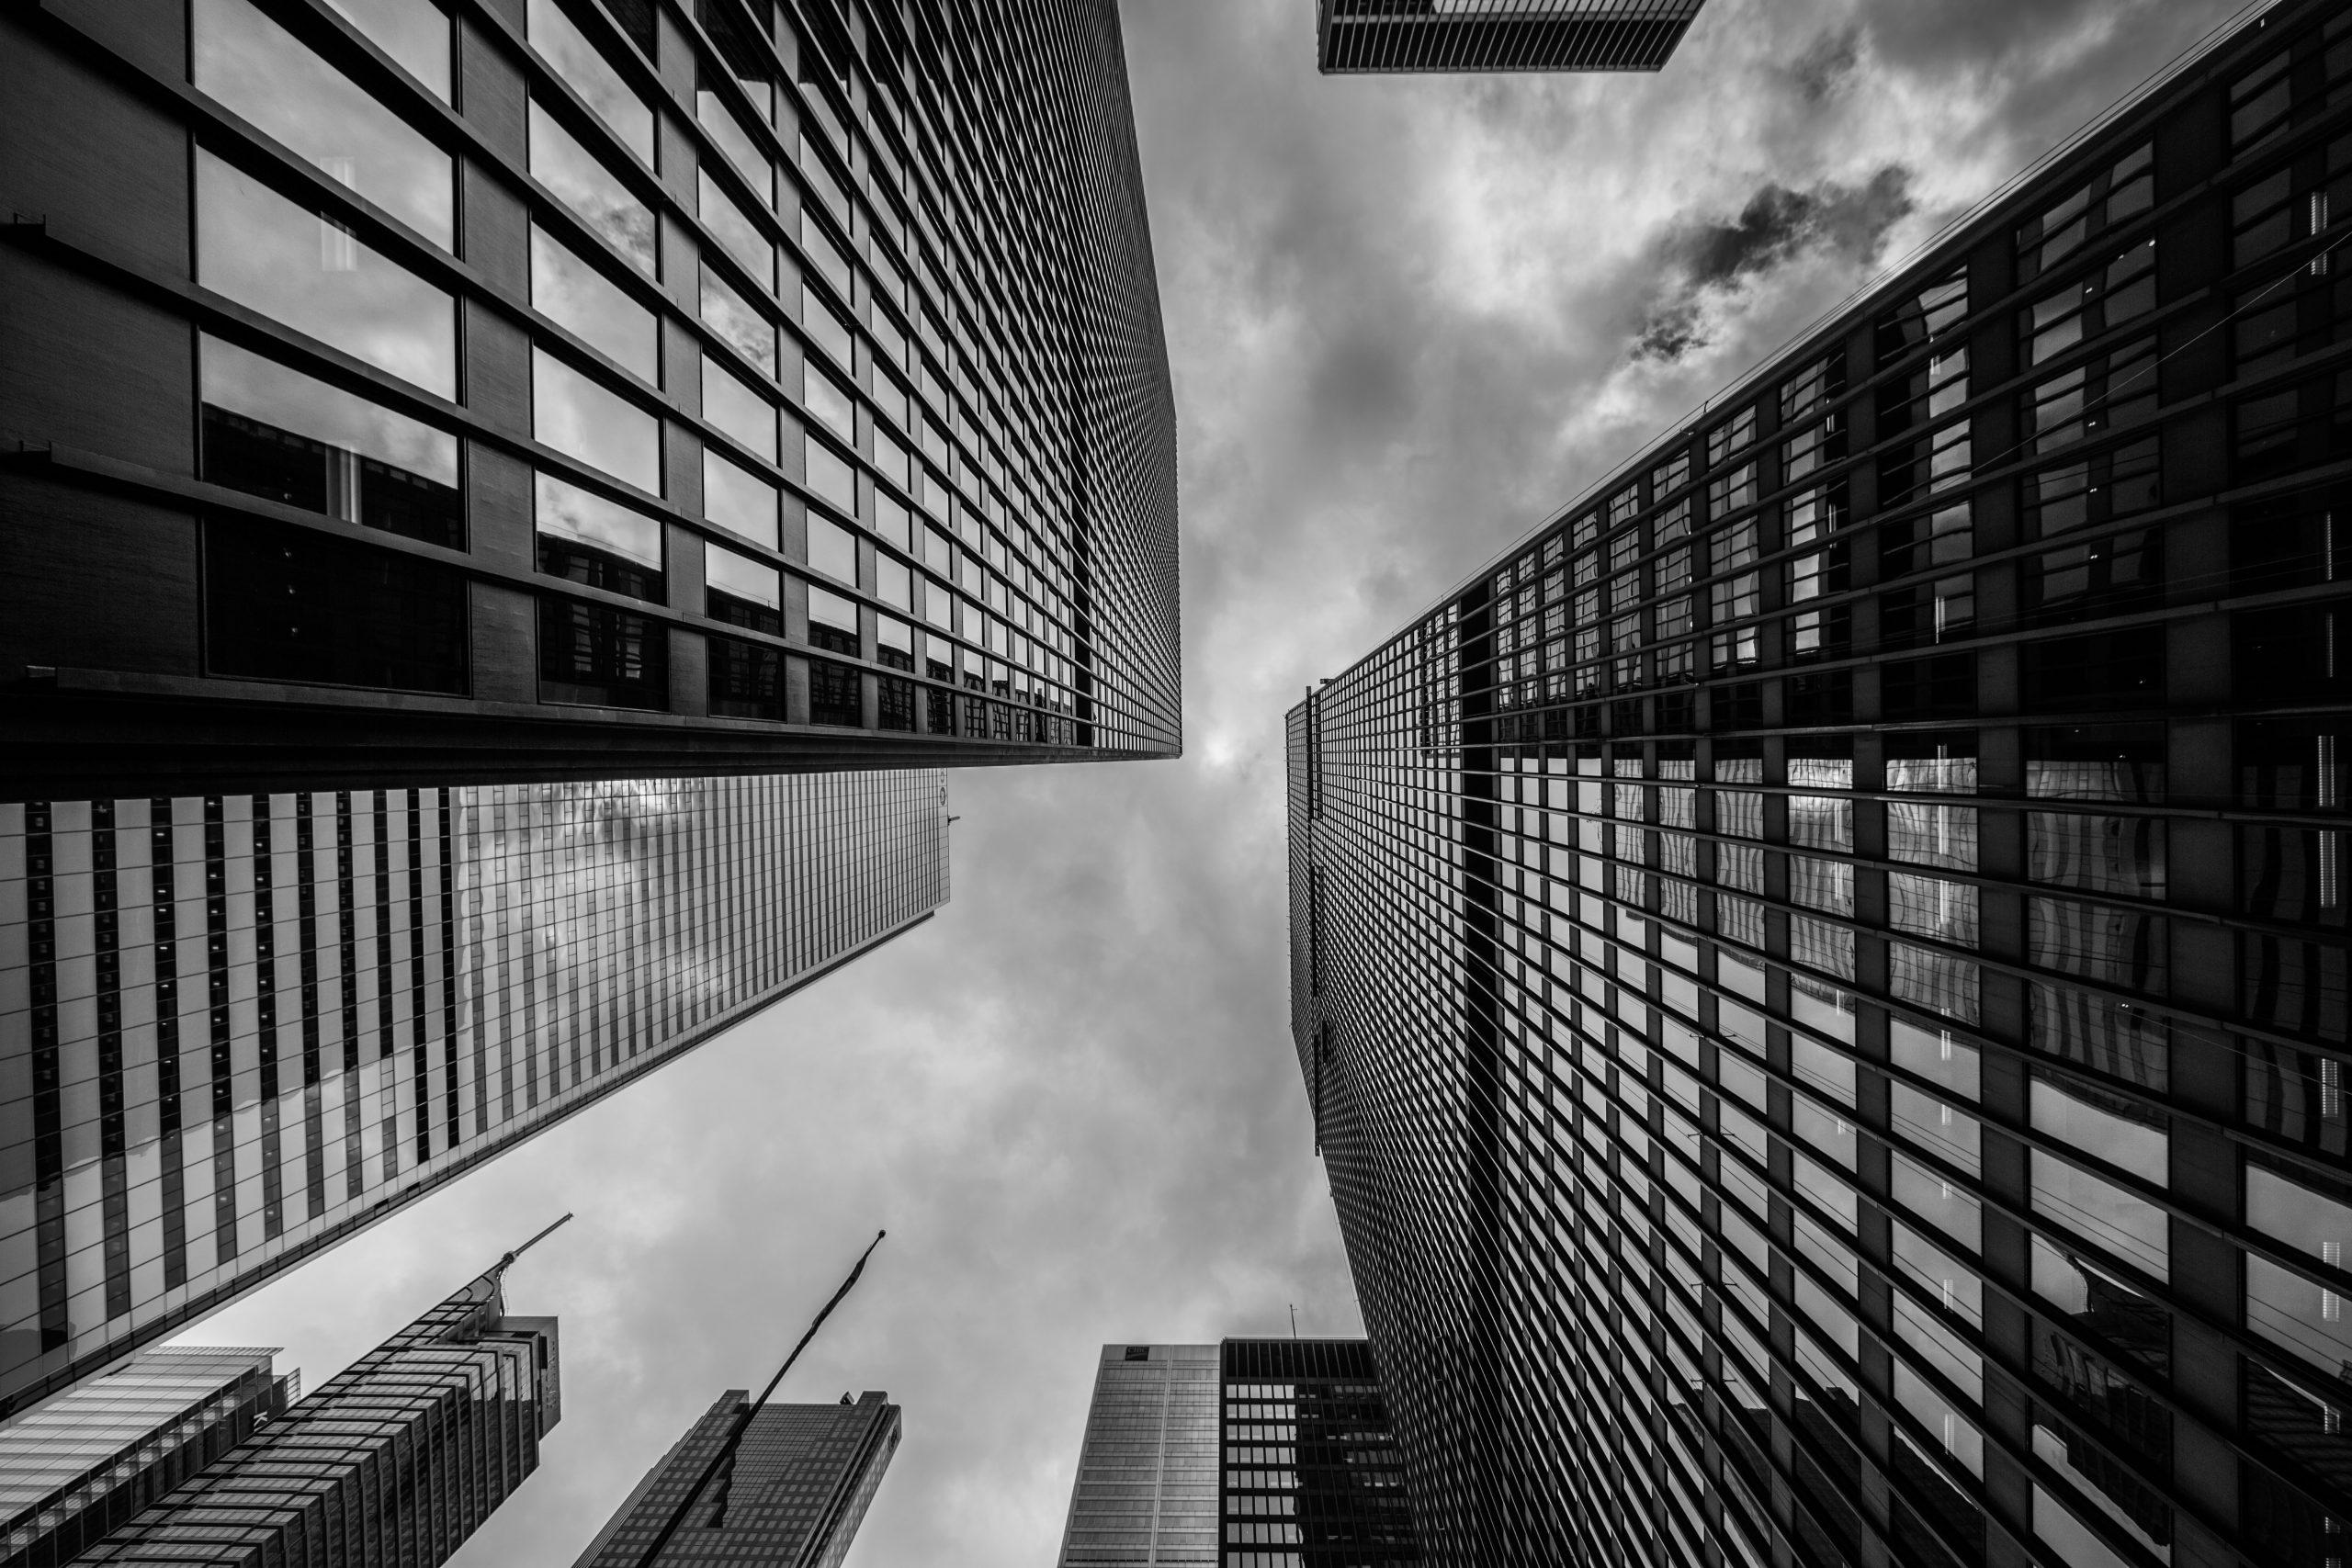 wallpaper Worm's-eye view of buildings